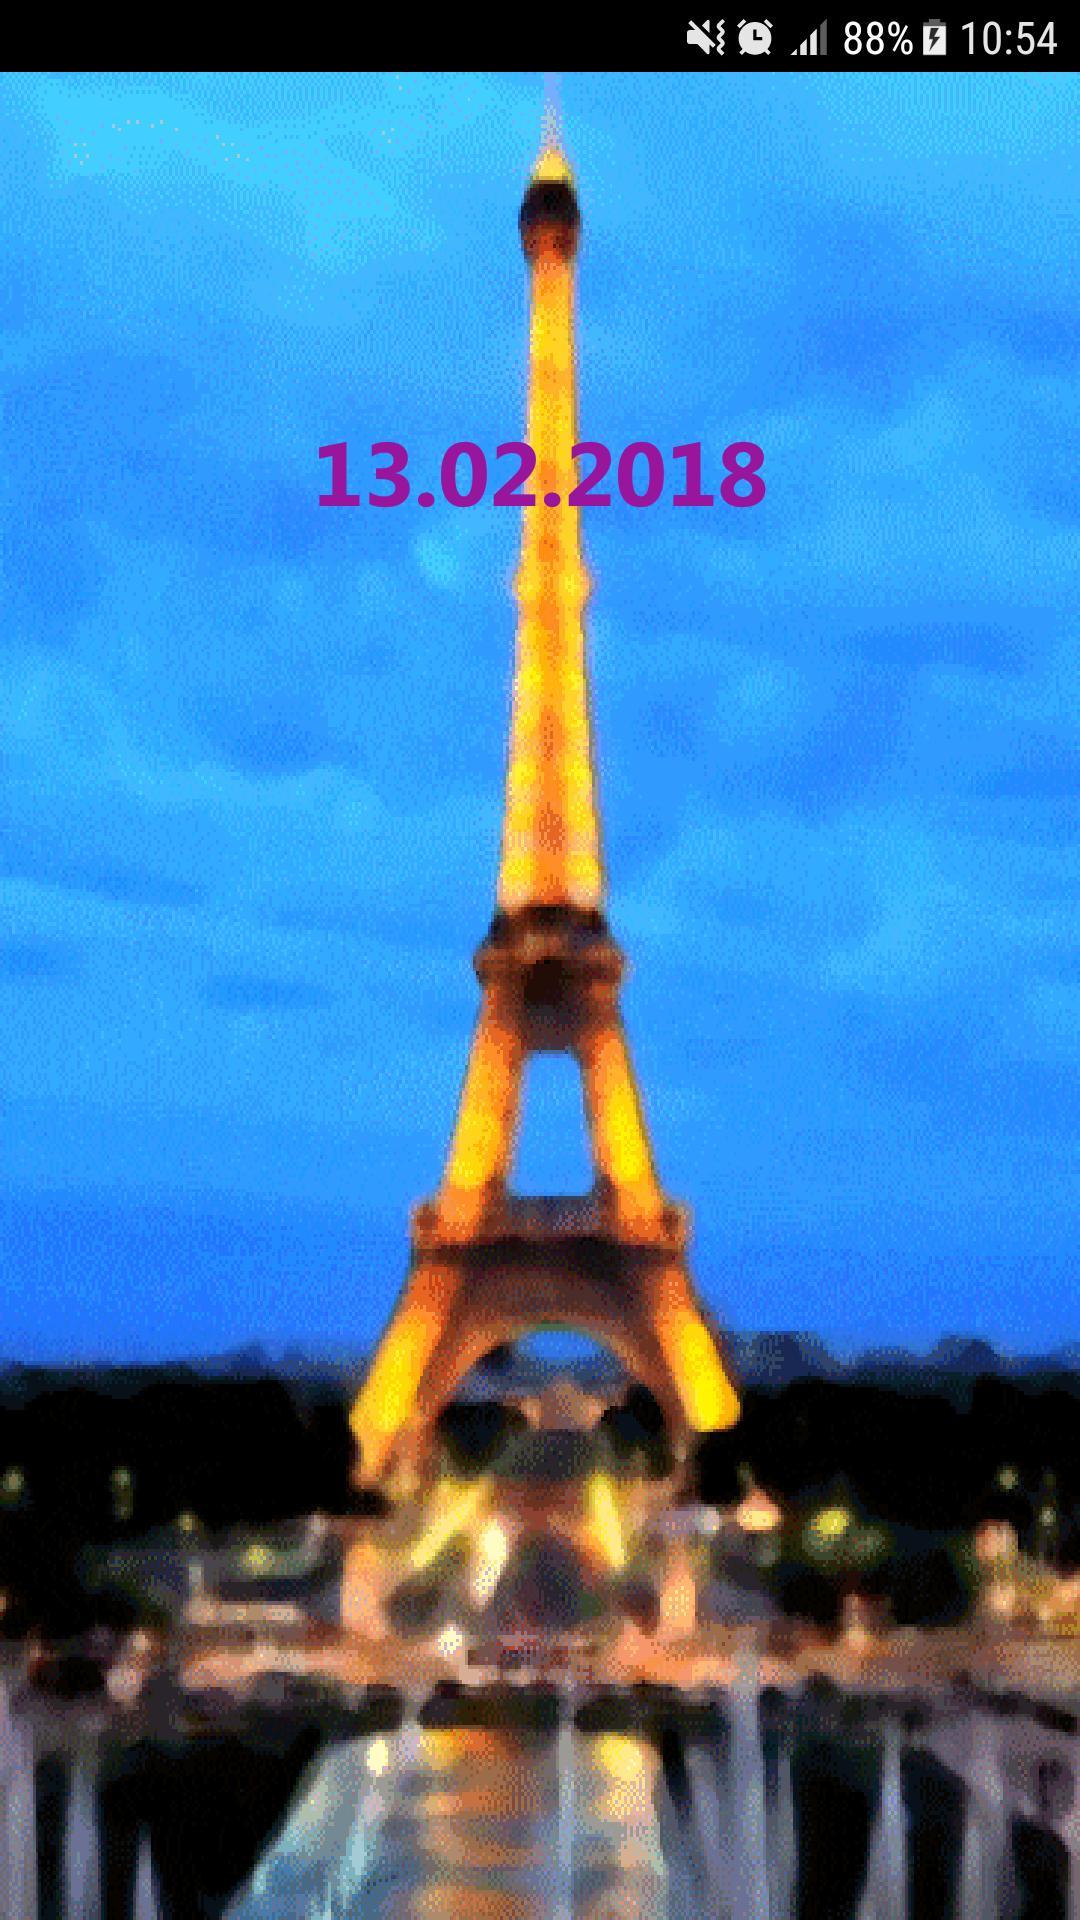 Wallpaper Menara Eiffel Paris Layar Kunci For Android APK